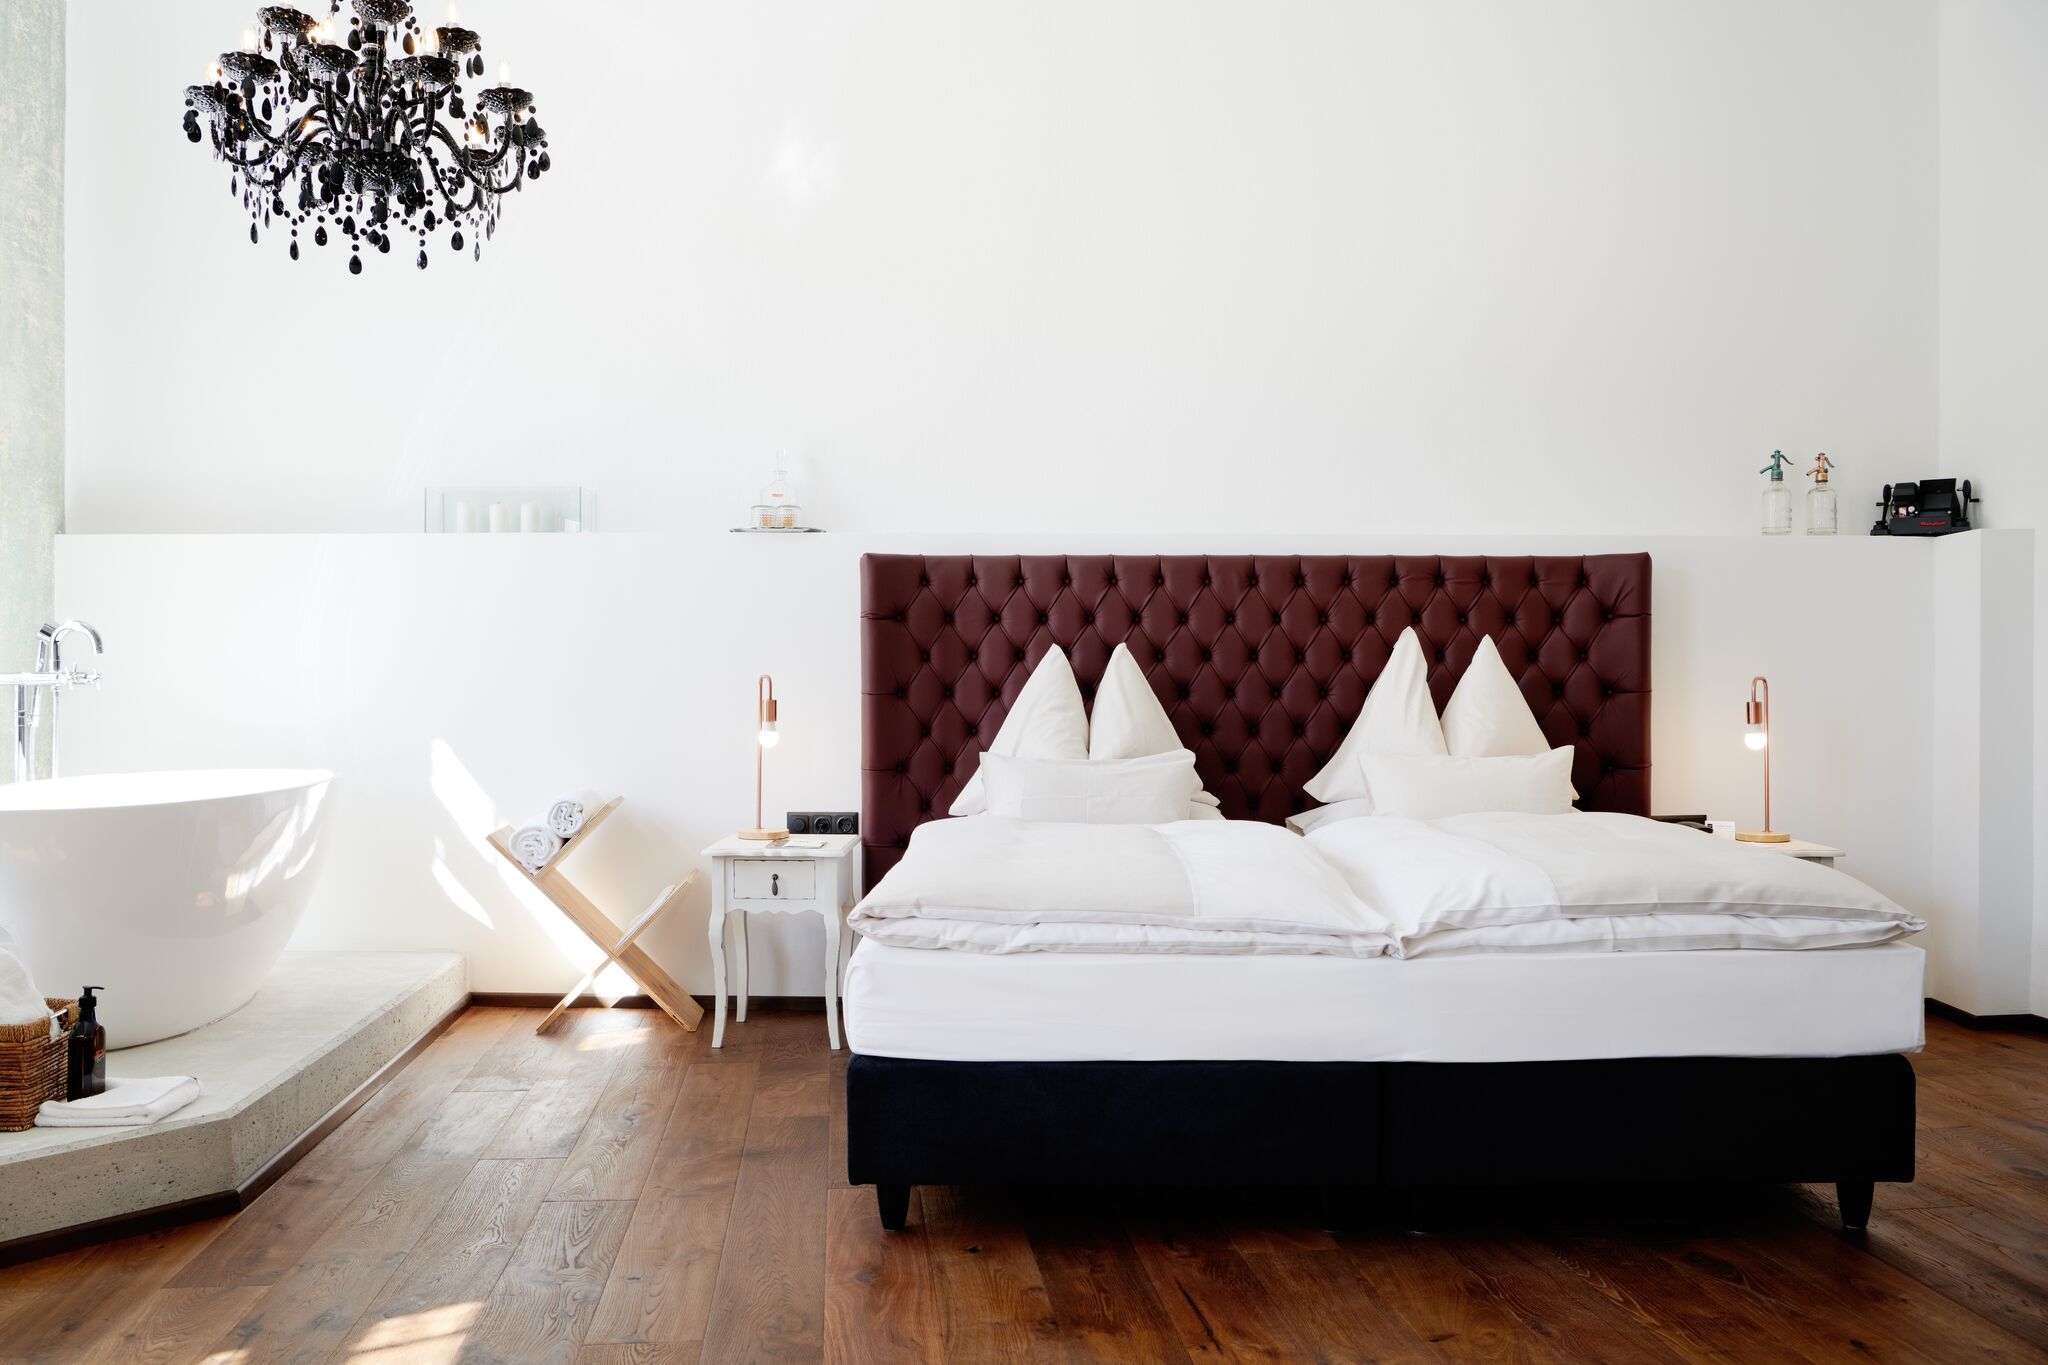 wiesler_hotel_graz